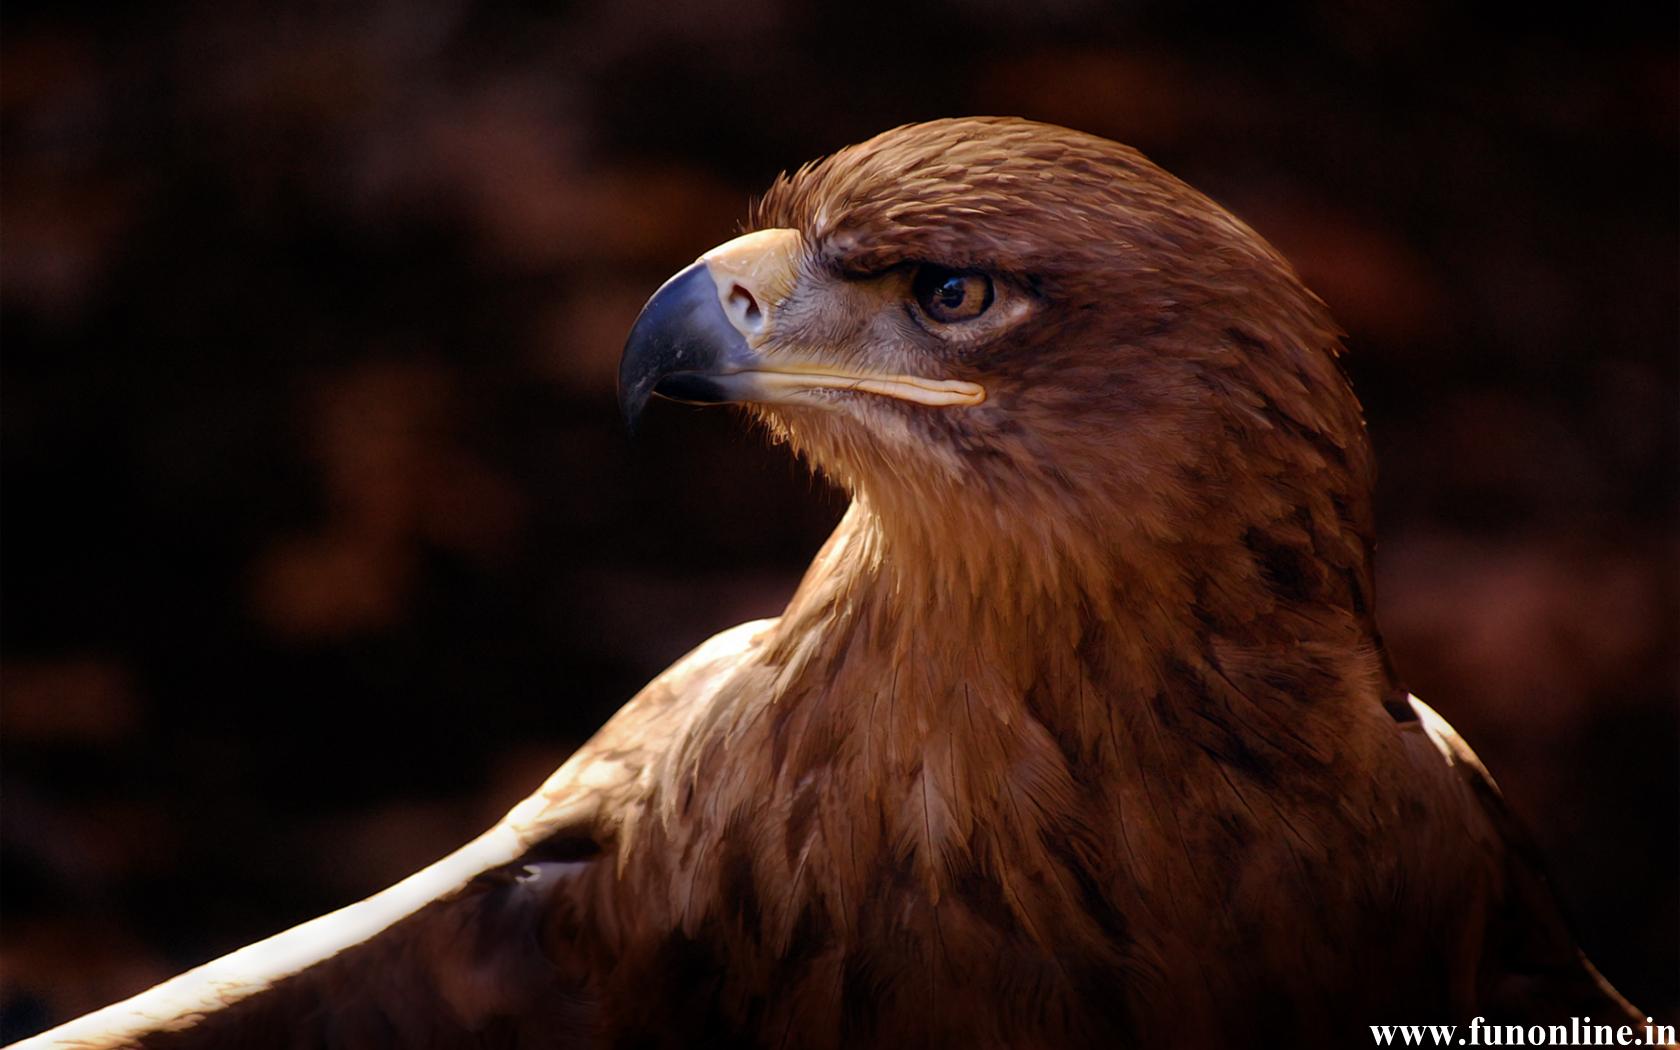 Eagle wallpaper for desktop wallpapersafari - Harpy eagle hd wallpaper ...